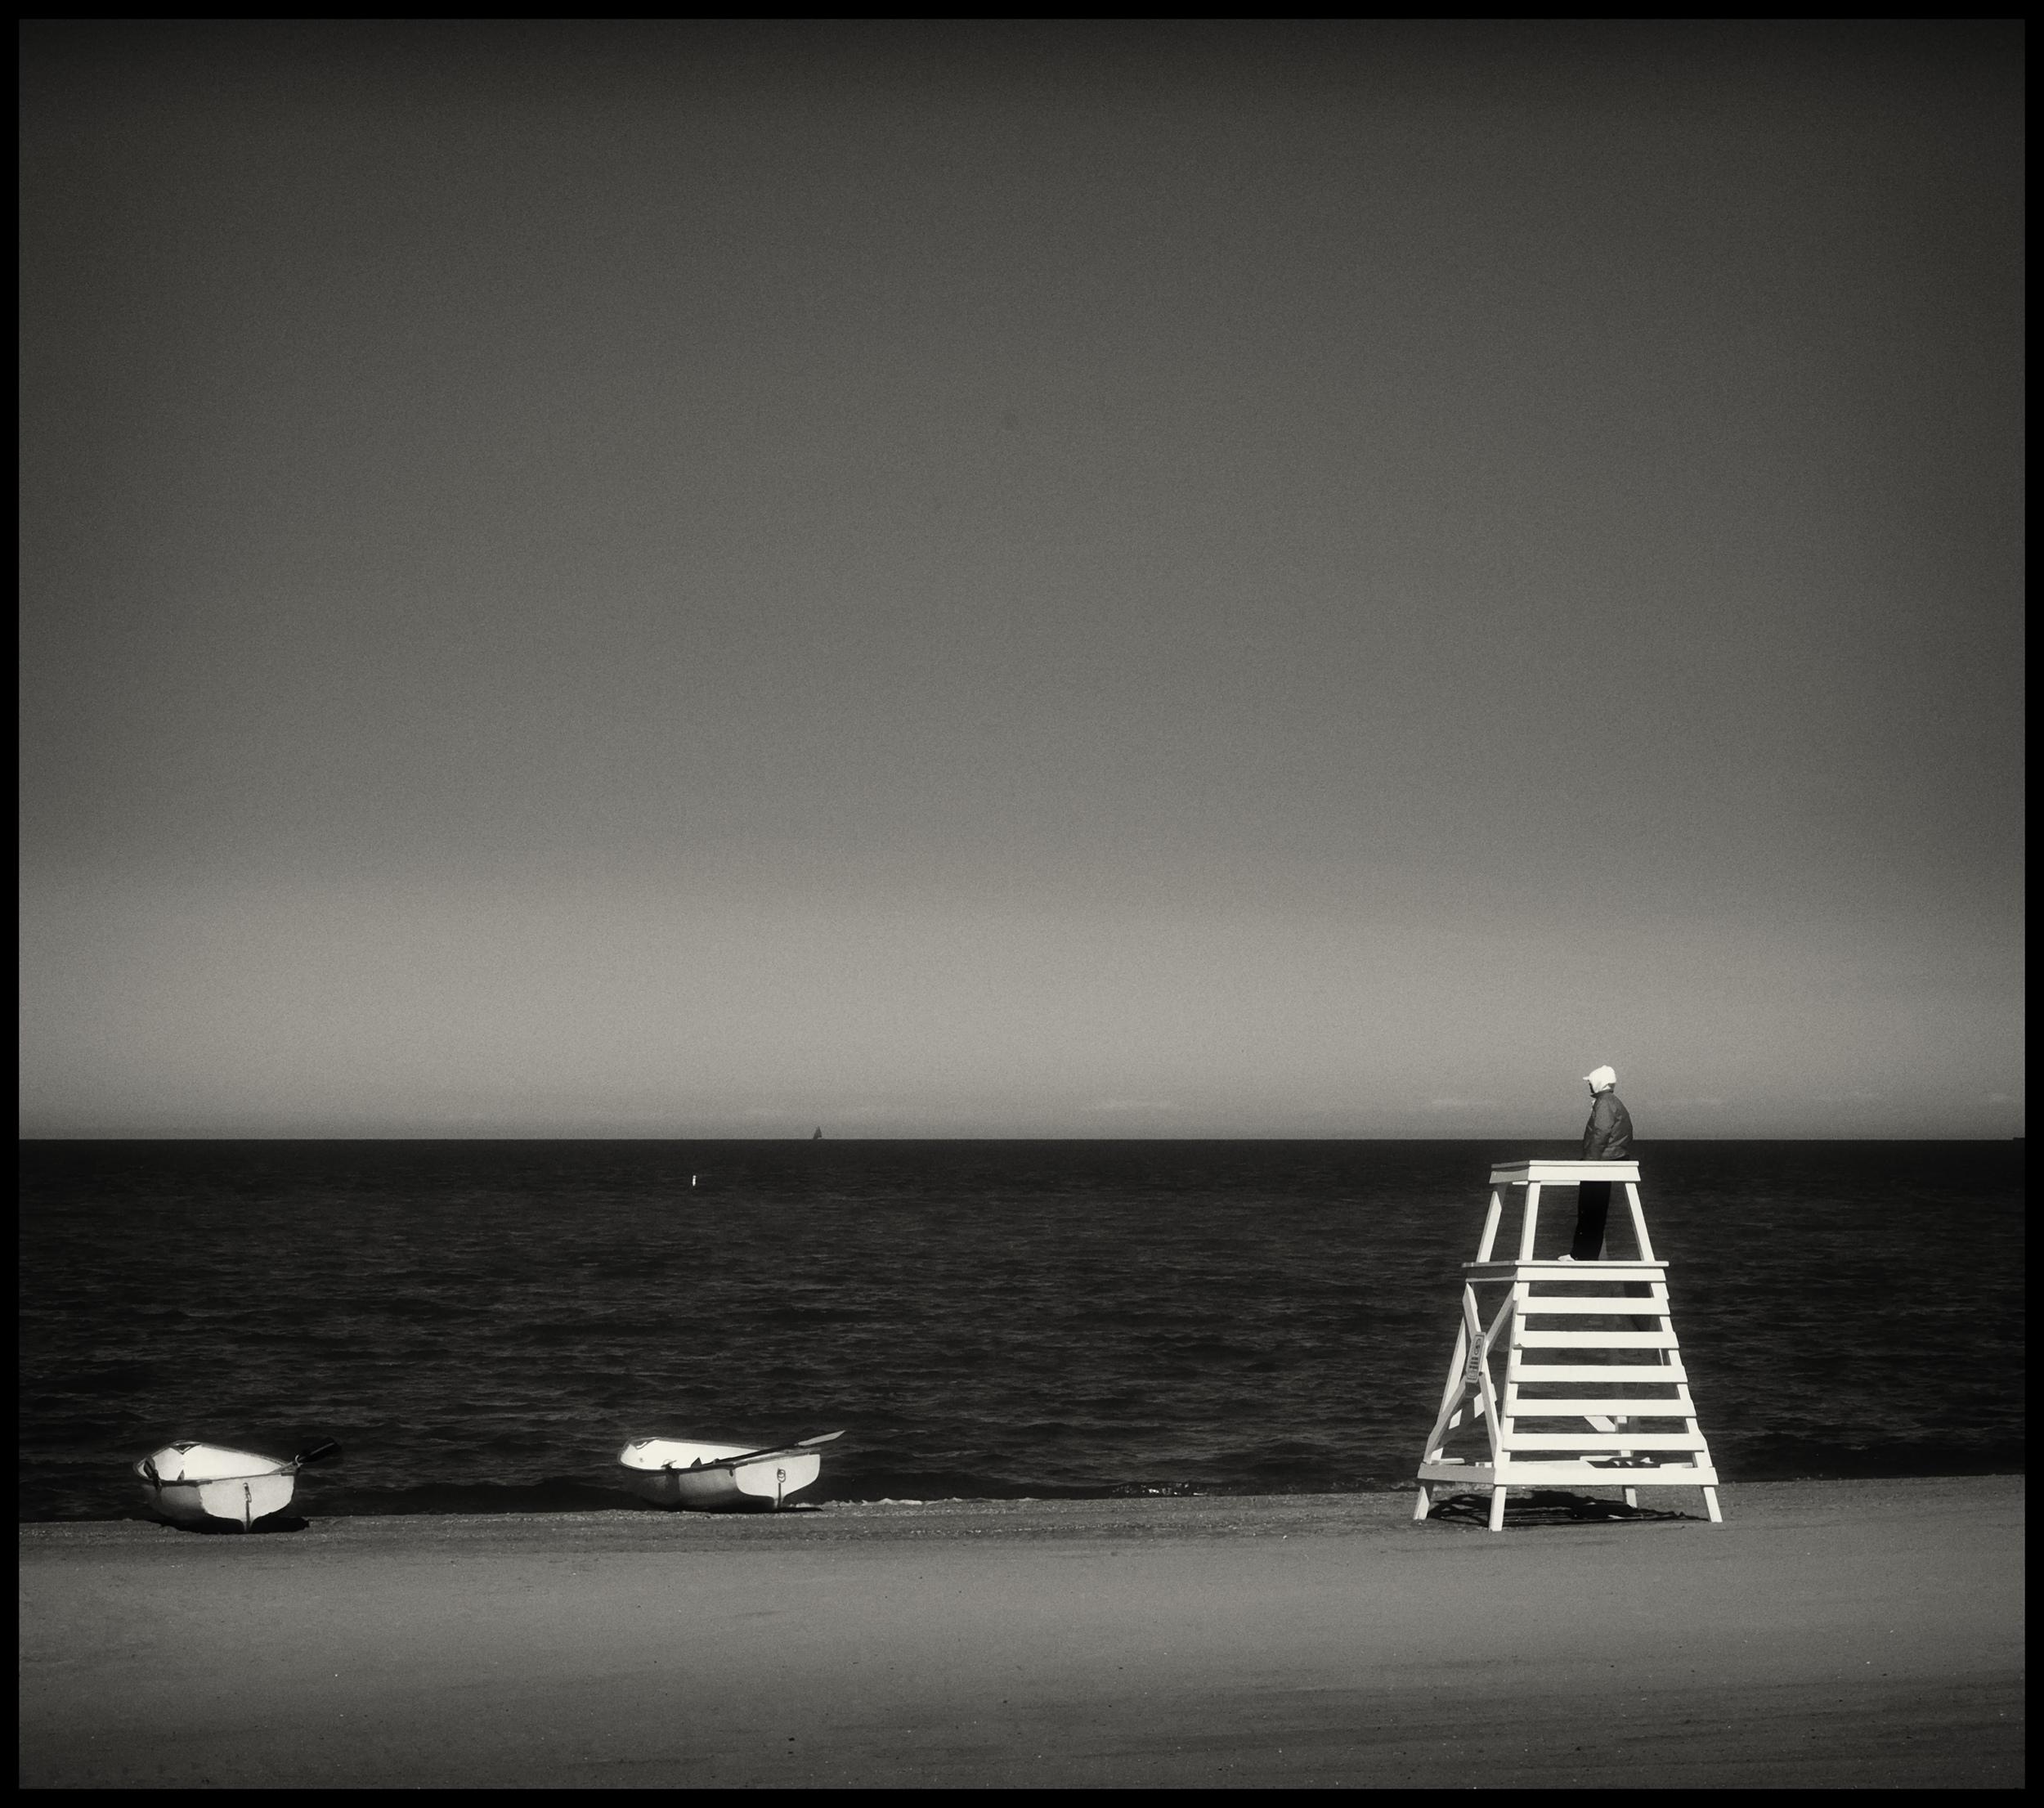 lifeguard-LMichigan.jpg